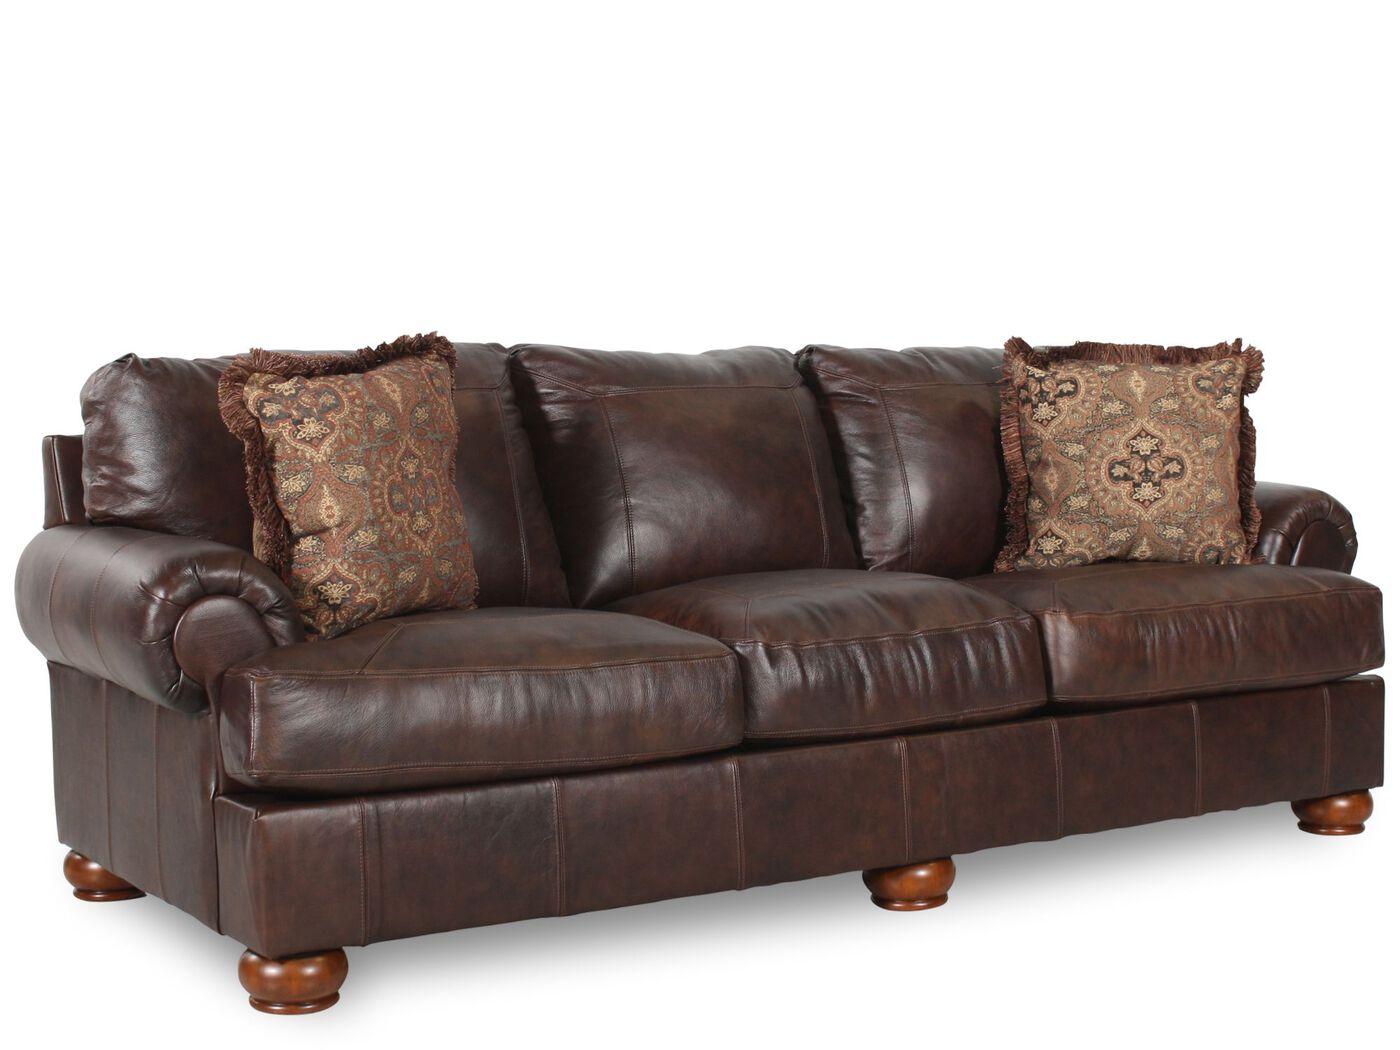 Ashley axiom walnut sofa ashley axiom walnut sofa